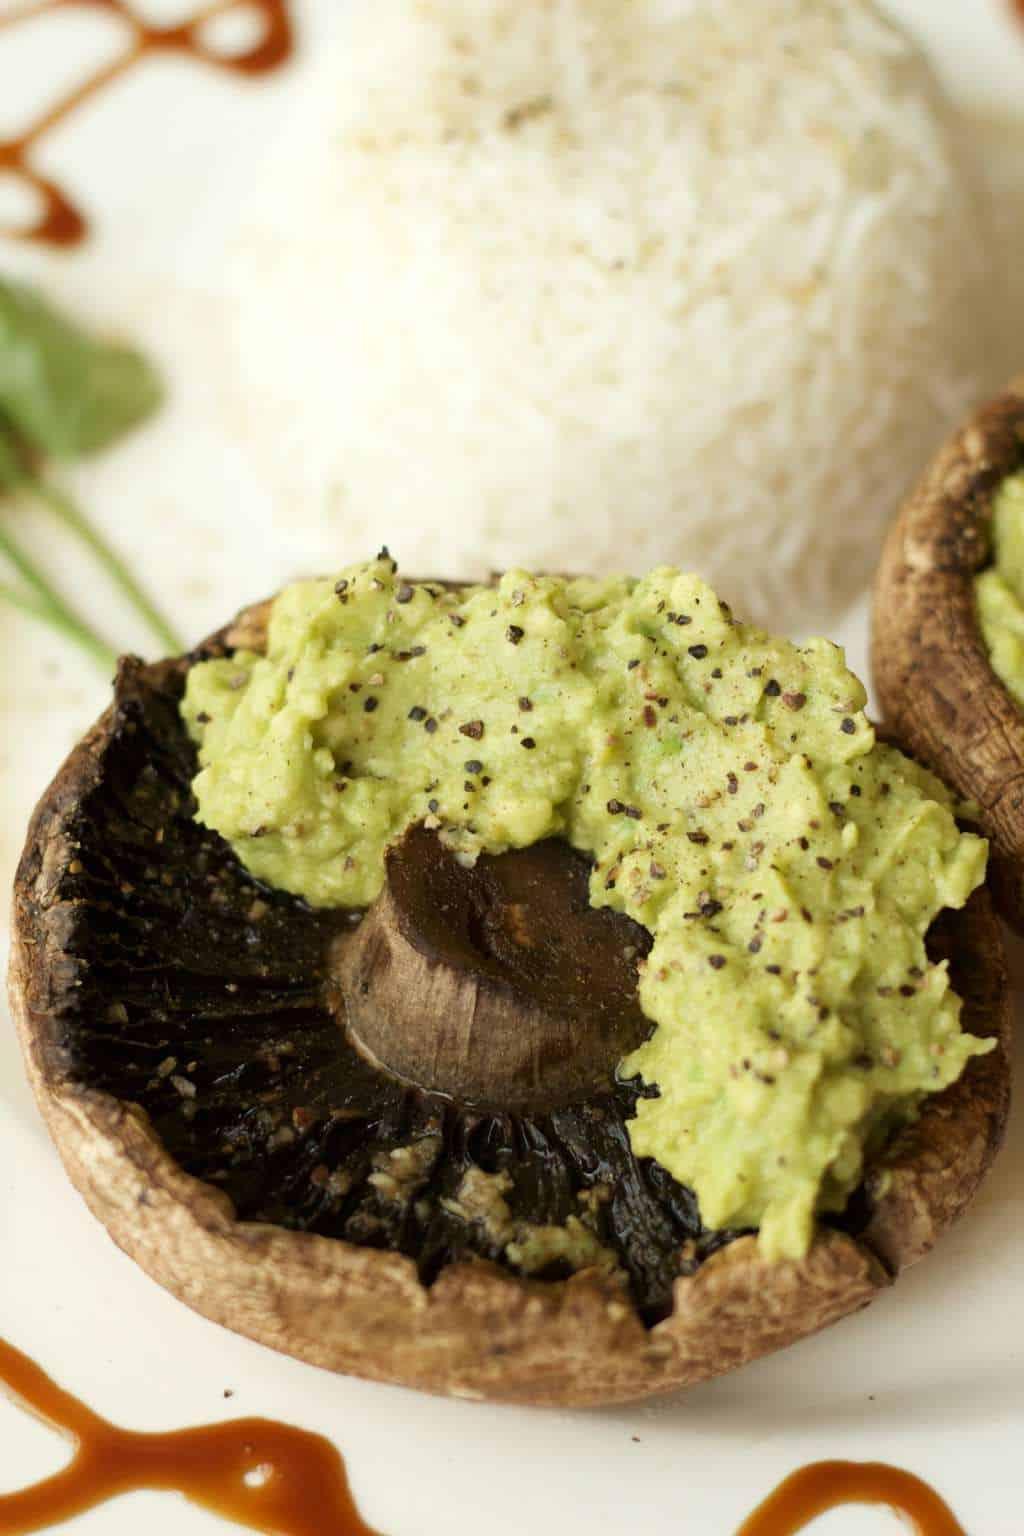 Portobello Mushrooms with Garlic and Avocado. Ideal as an appetizer! #vegan #lovingitvegan #dairyfree #glutenfree